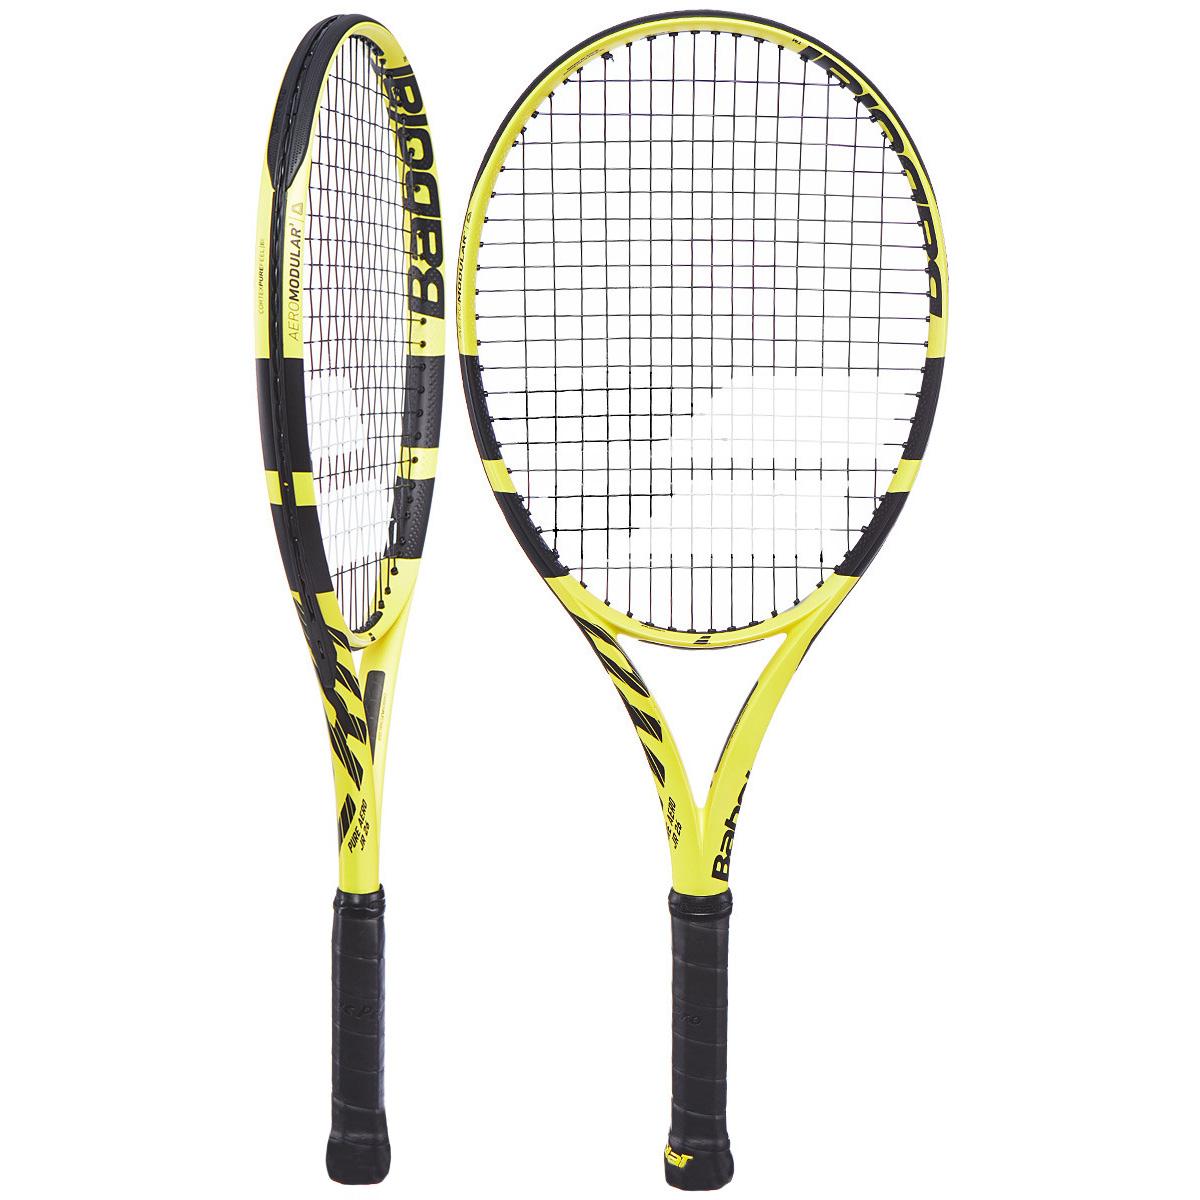 60bf56df1 Raquete de Tênis Babolat Pure Aero Junior 26 - Empório do Tenista